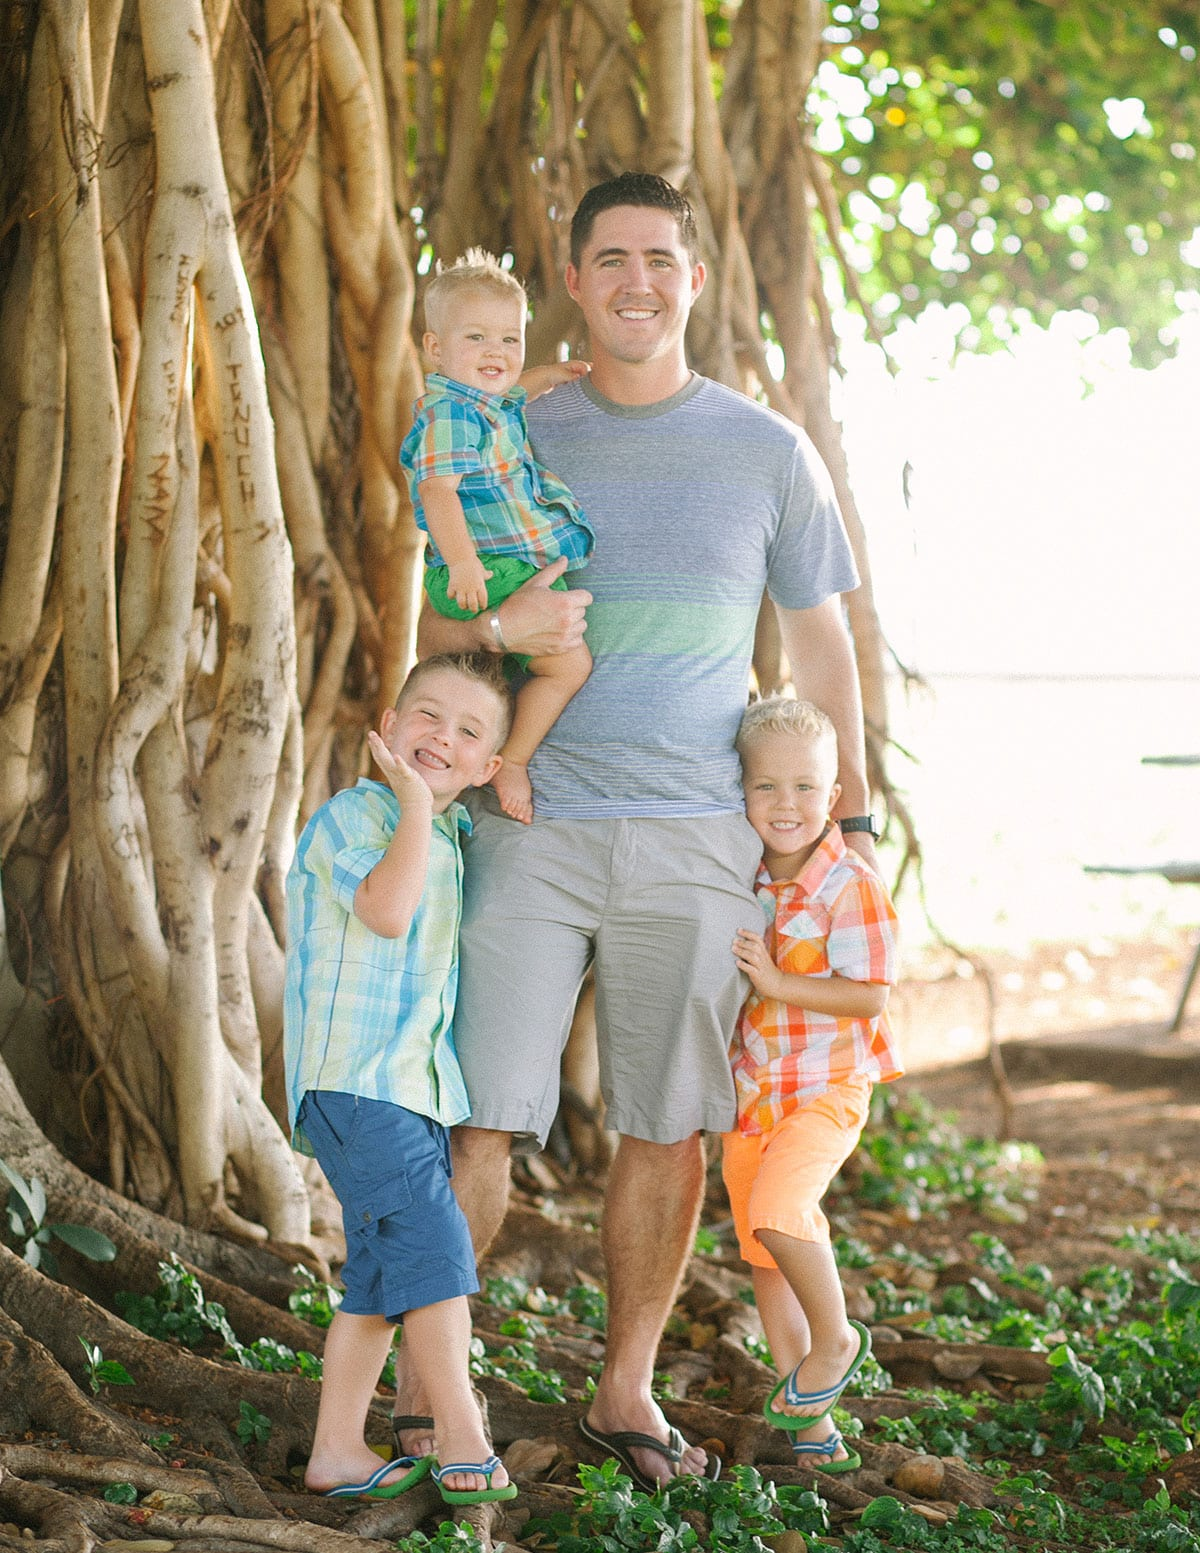 kline-family-honolulu-family-photographer-1018